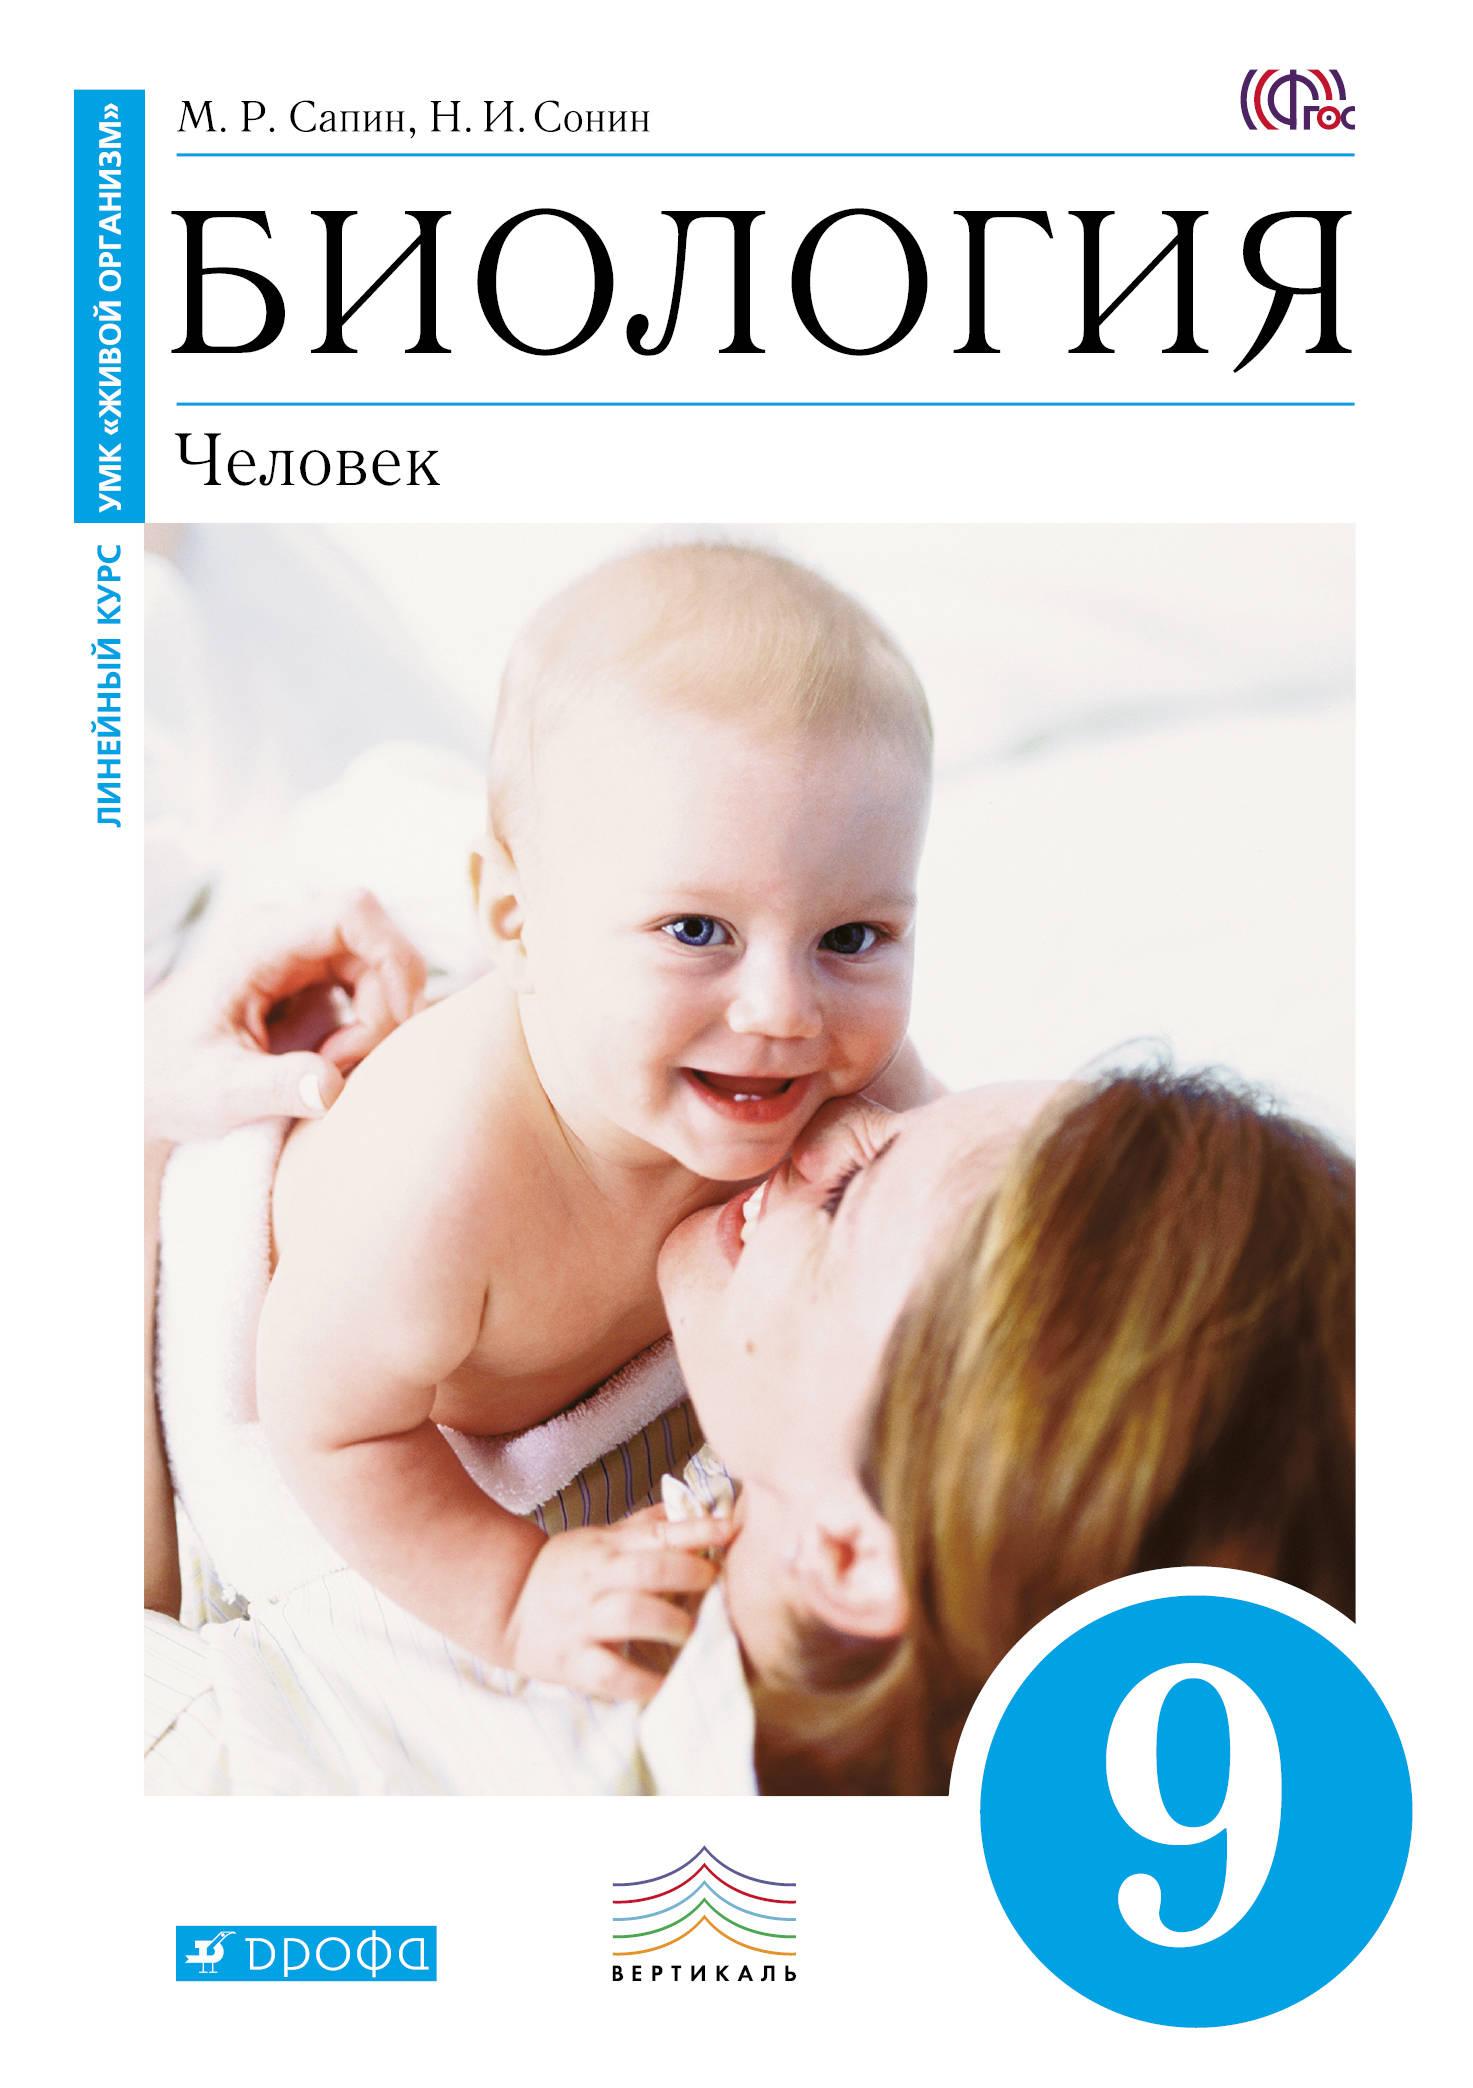 Биология. Человек. 9 класс. Учебник. М. Р. Сапин, Н. И. Сонин